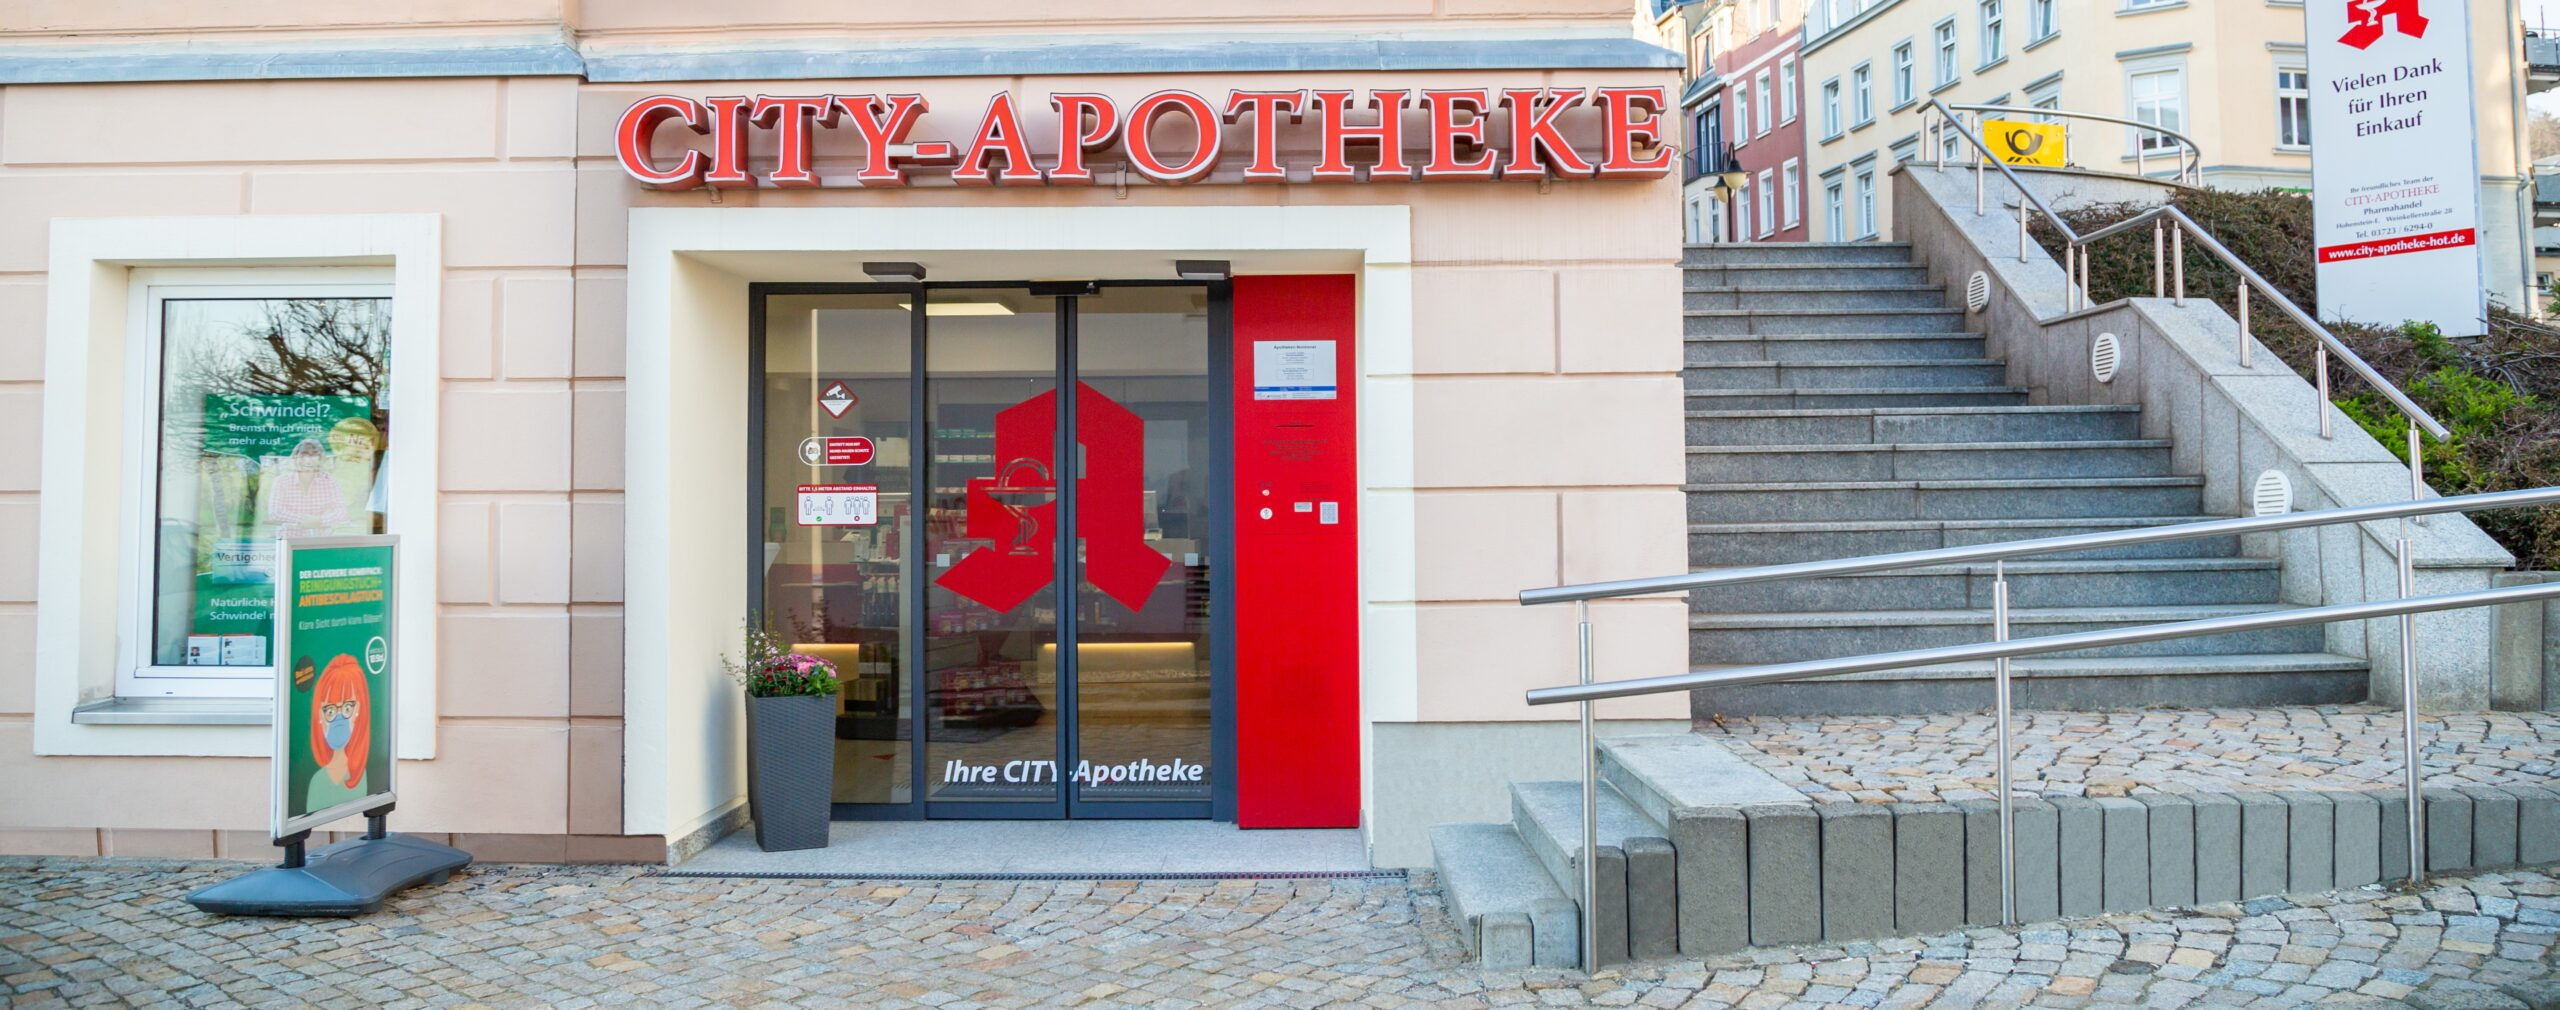 City Apotheke HOT